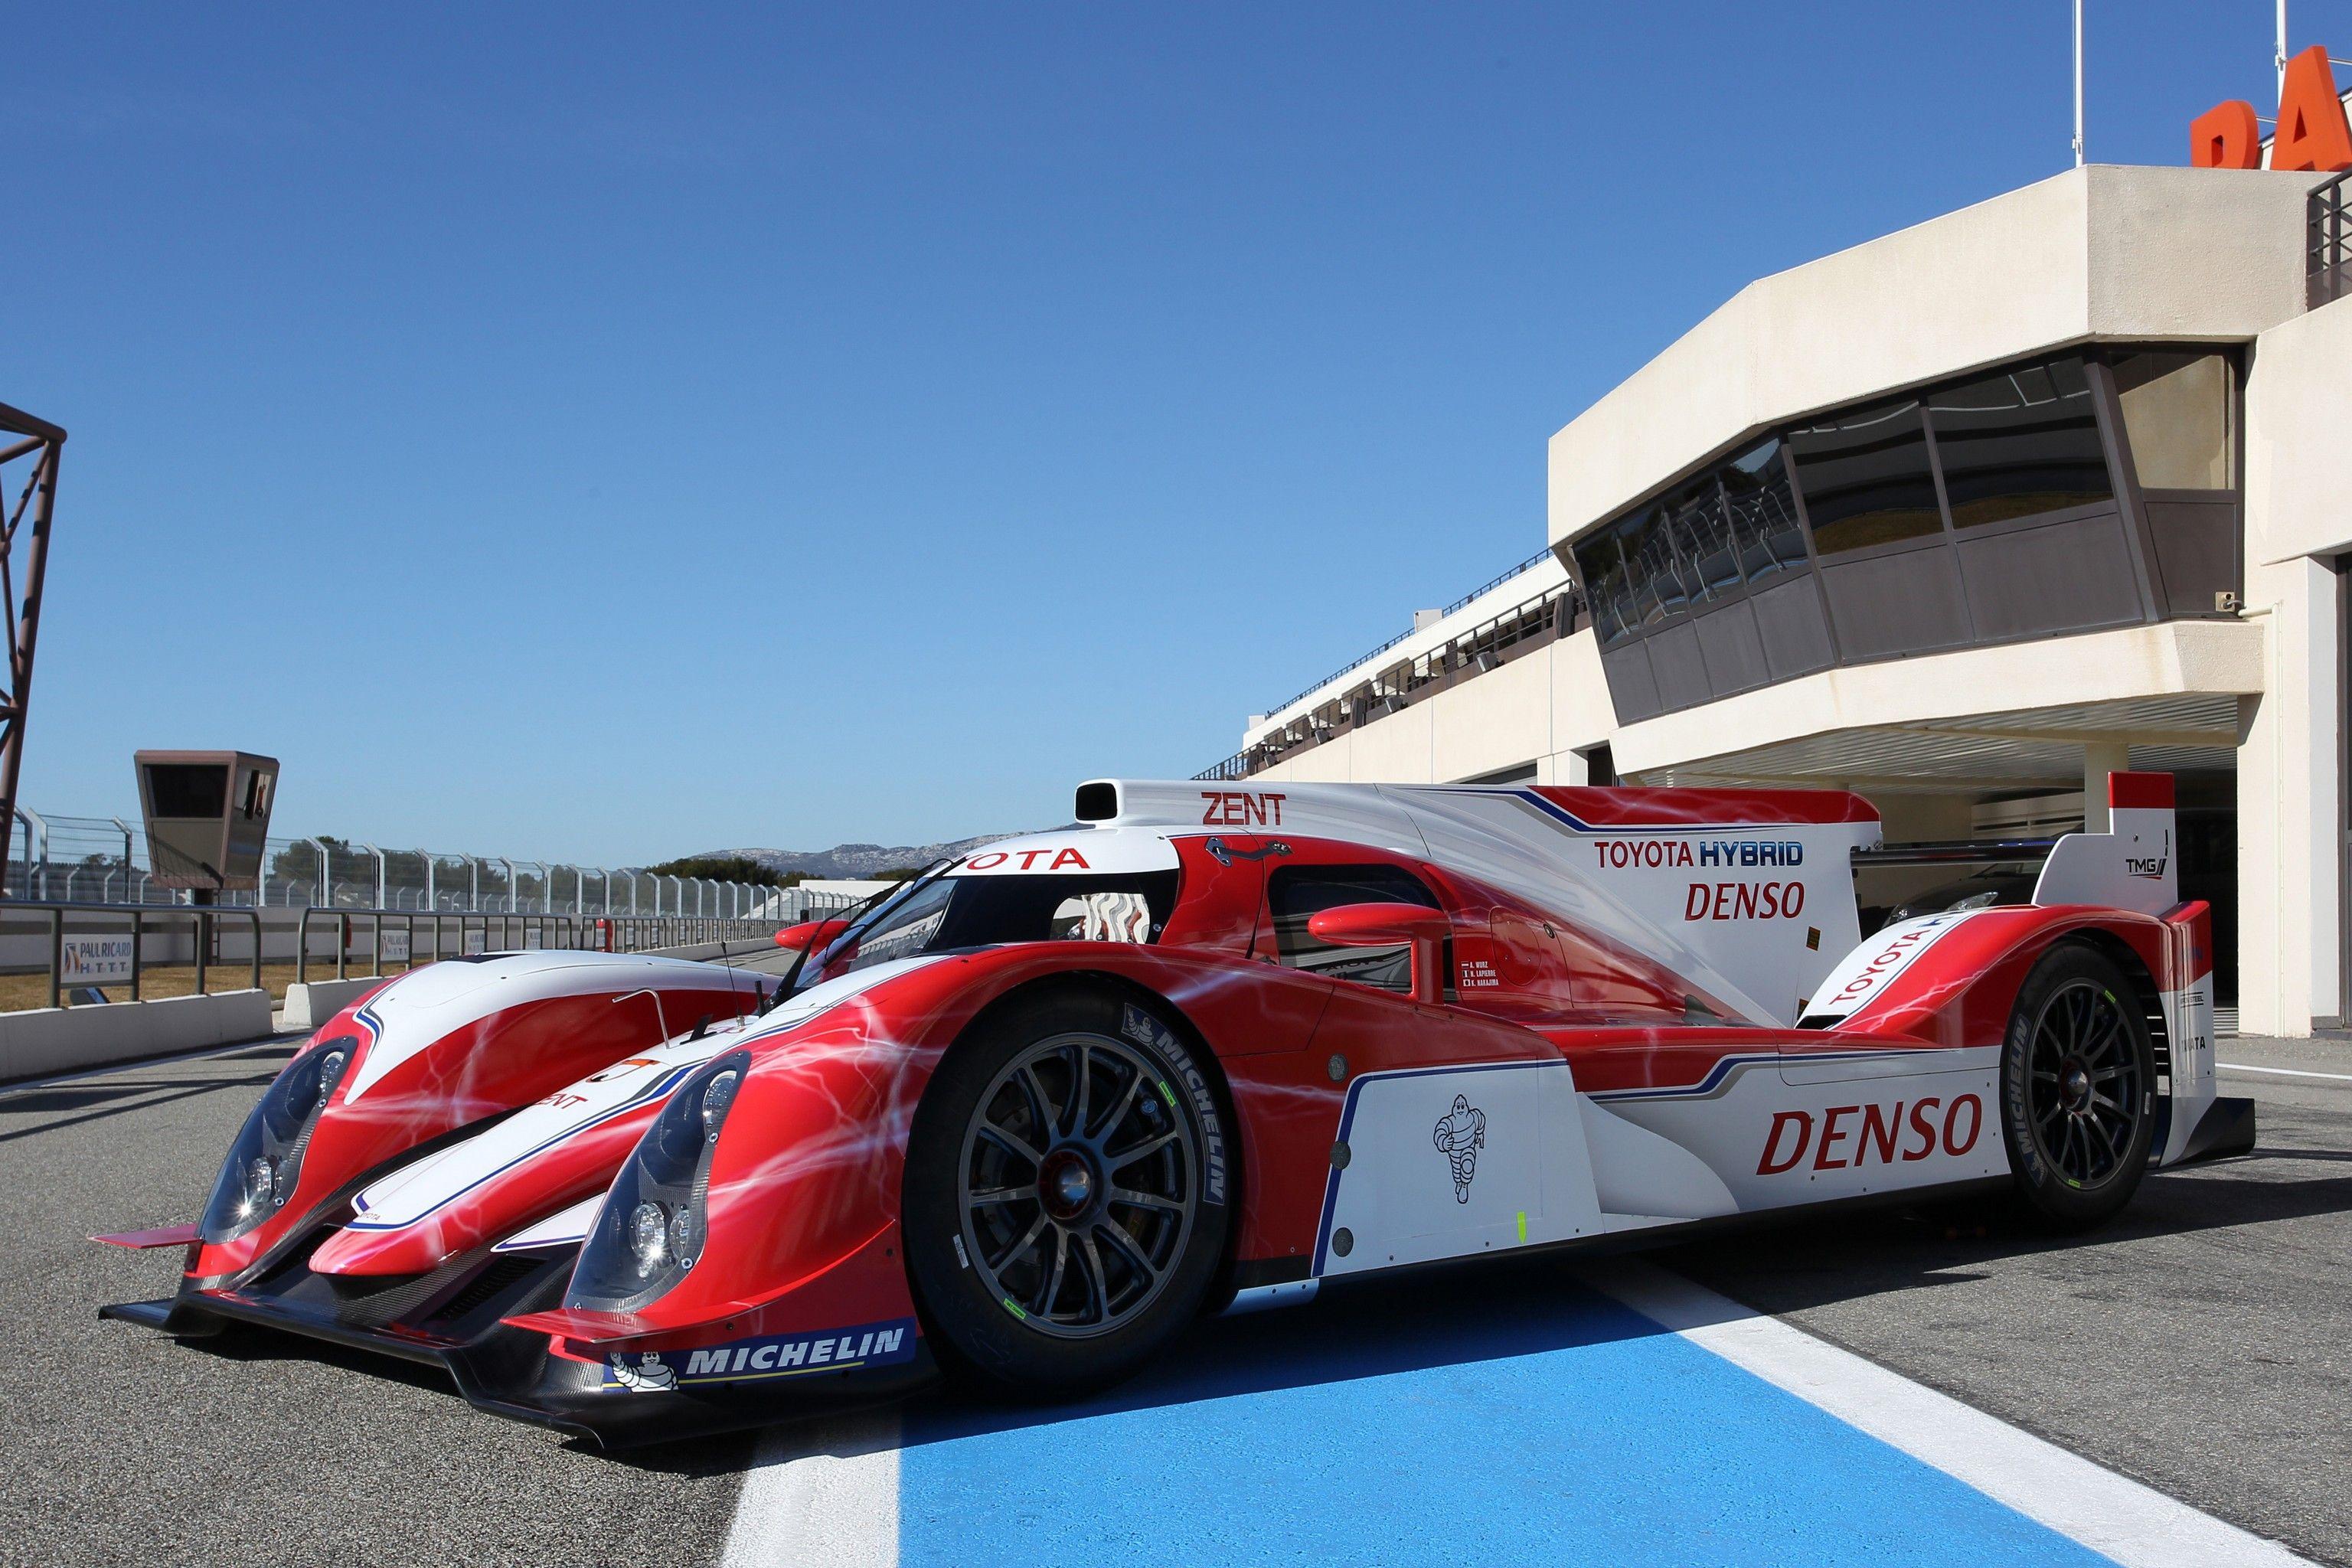 Denso Sponsors Toyota Hybrid Racing